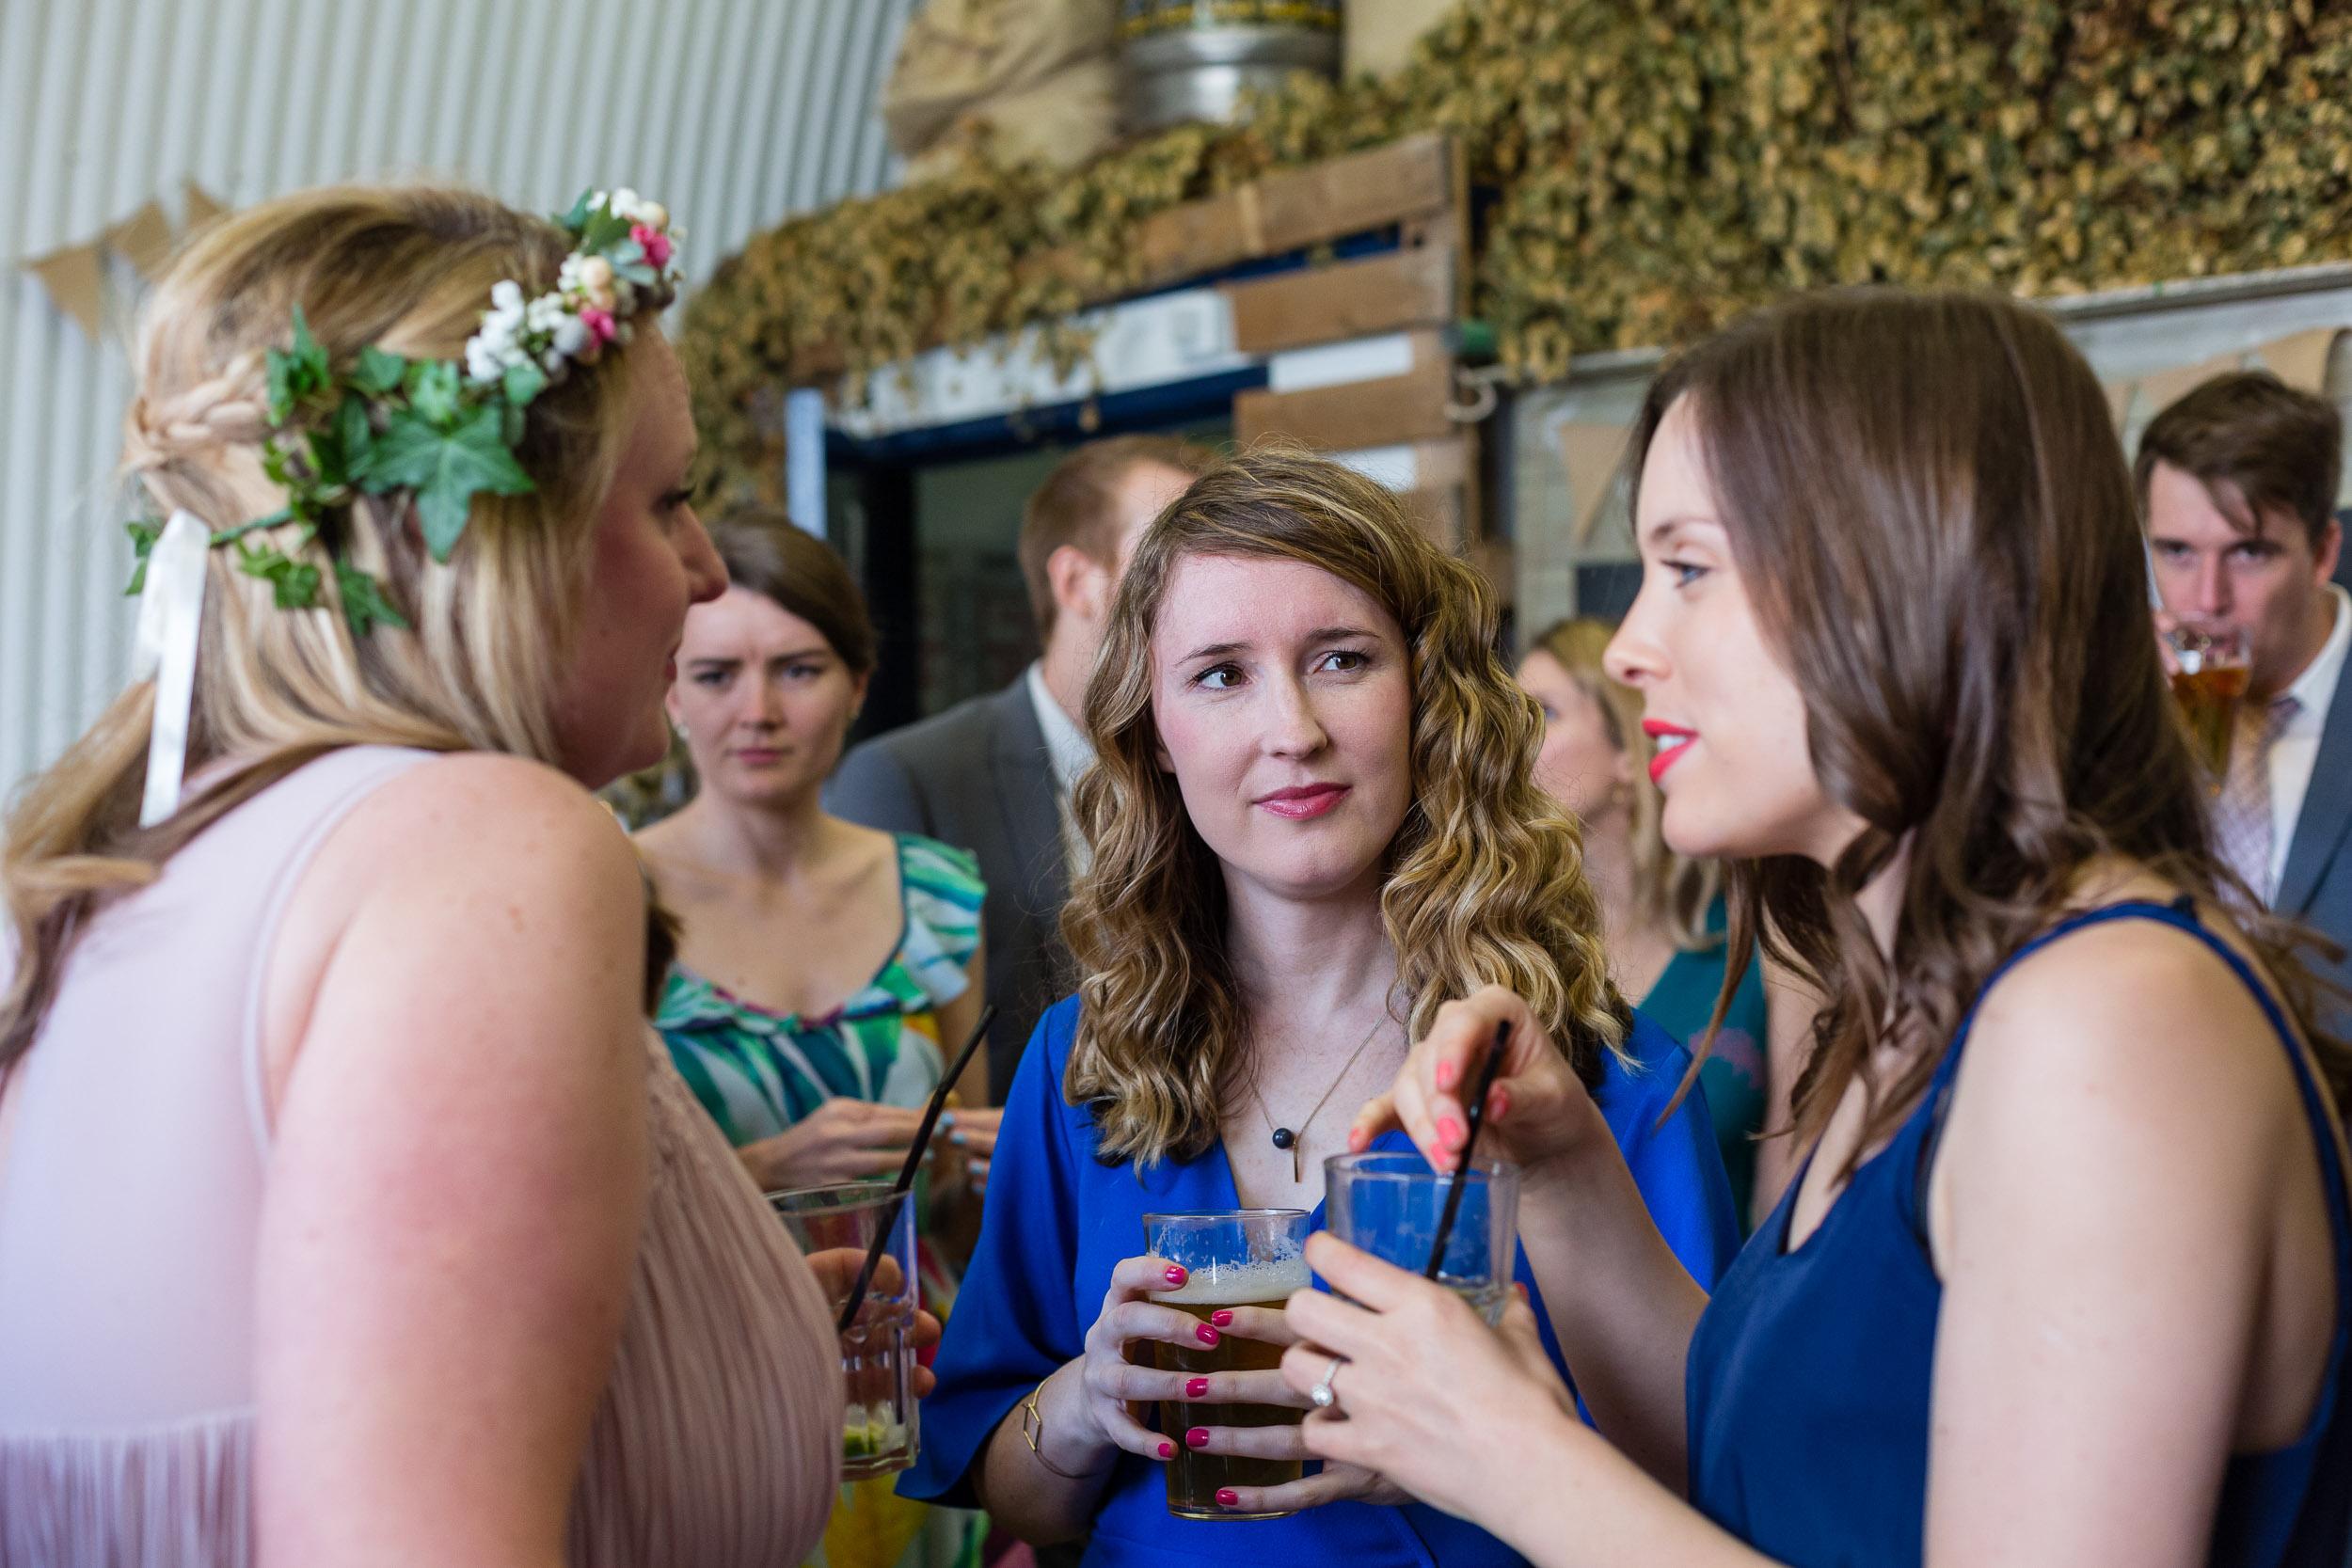 brockwell-lido-brixton-herne-hill-wedding-076.jpg